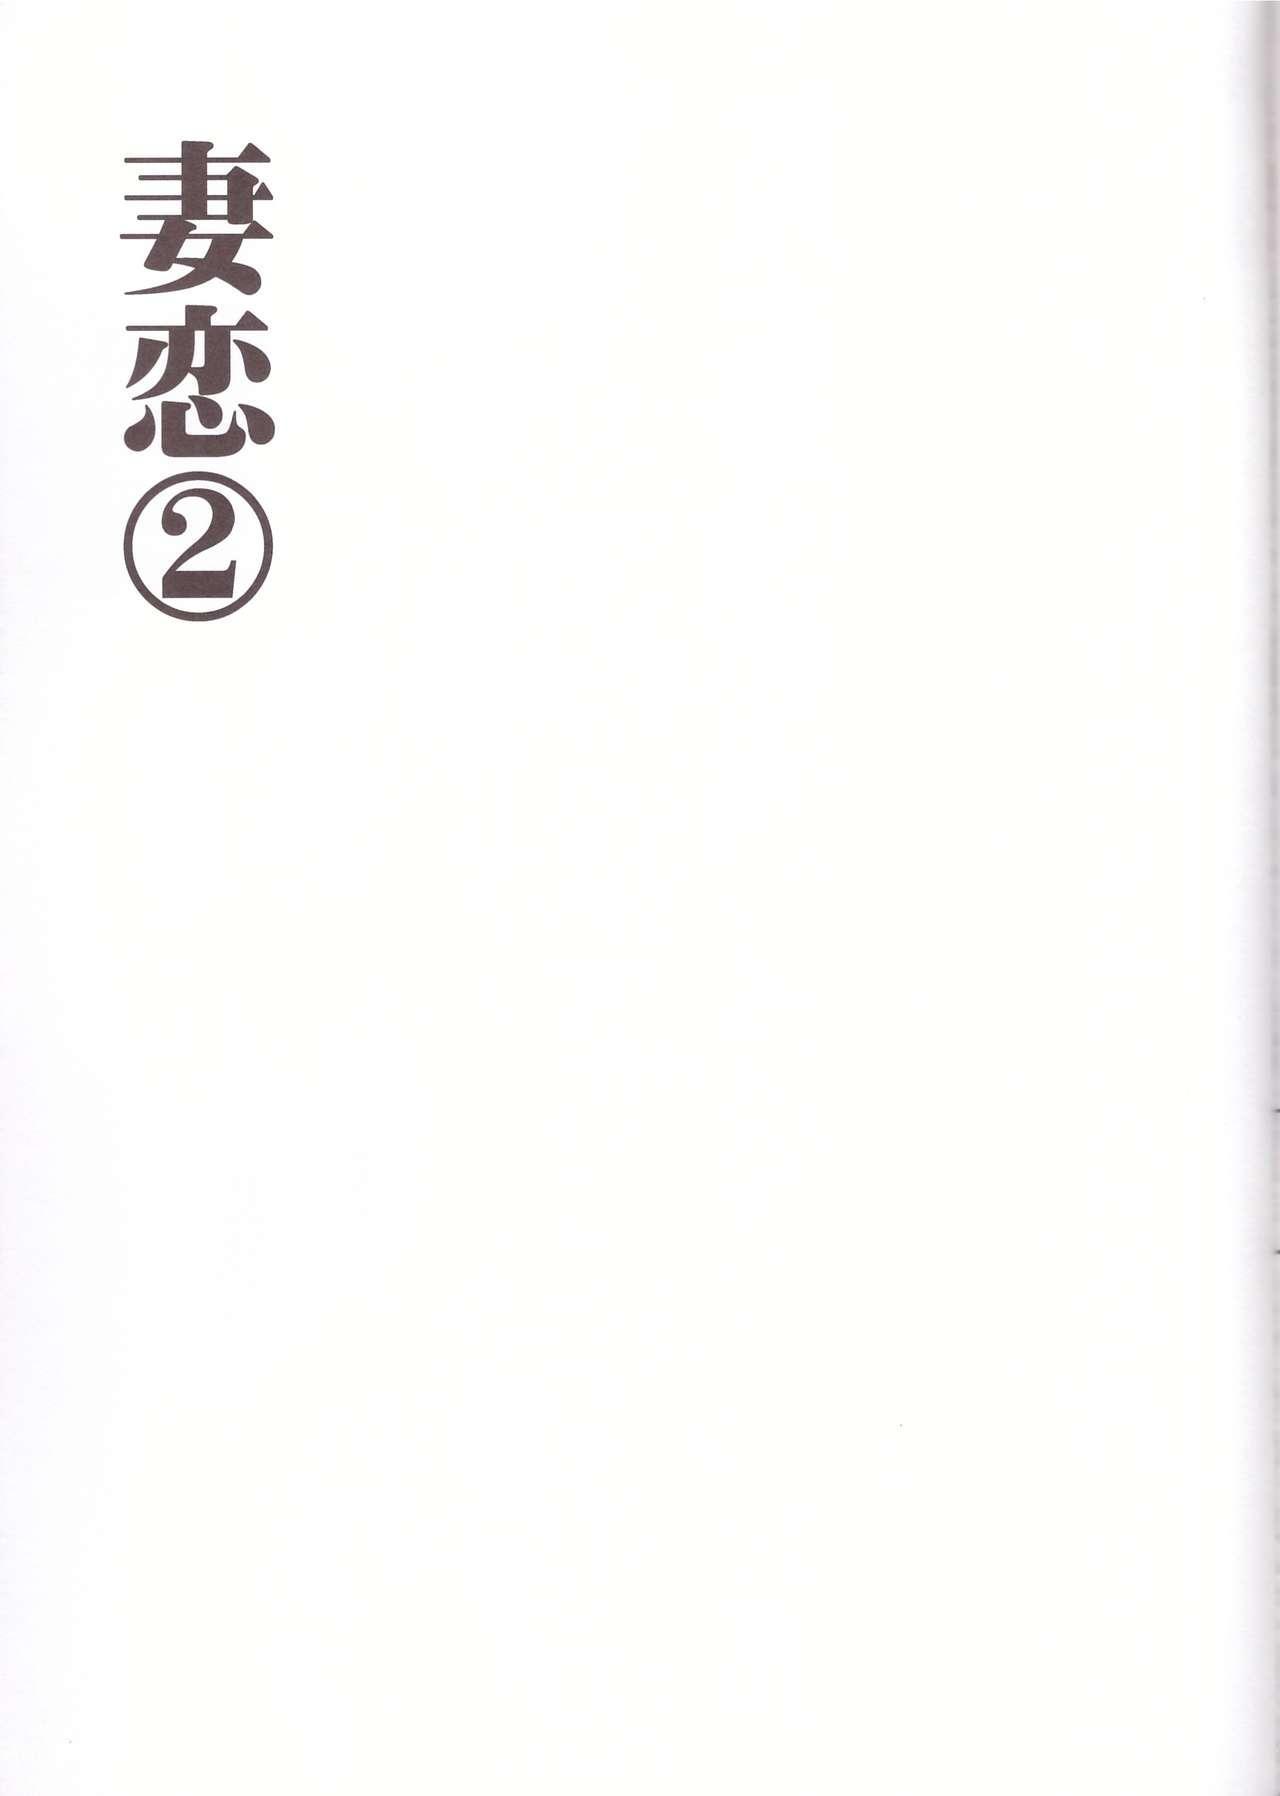 Tsuma koi2 22